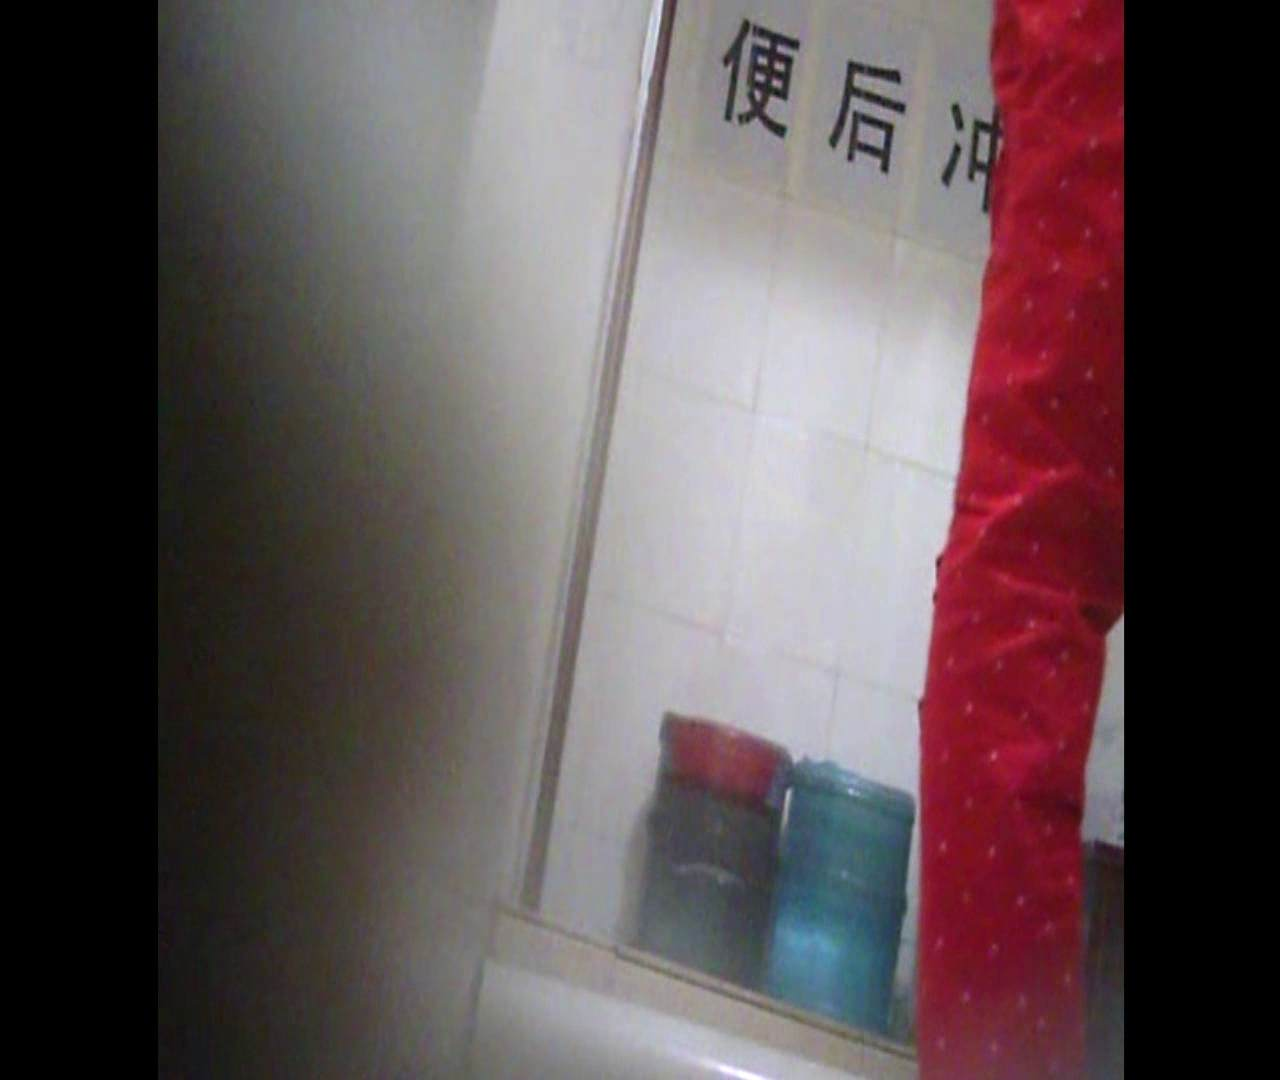 Vol.01 赤のパンツスタイルがとっても眩しい!! パンツ特集 AV無料動画キャプチャ 61画像 5